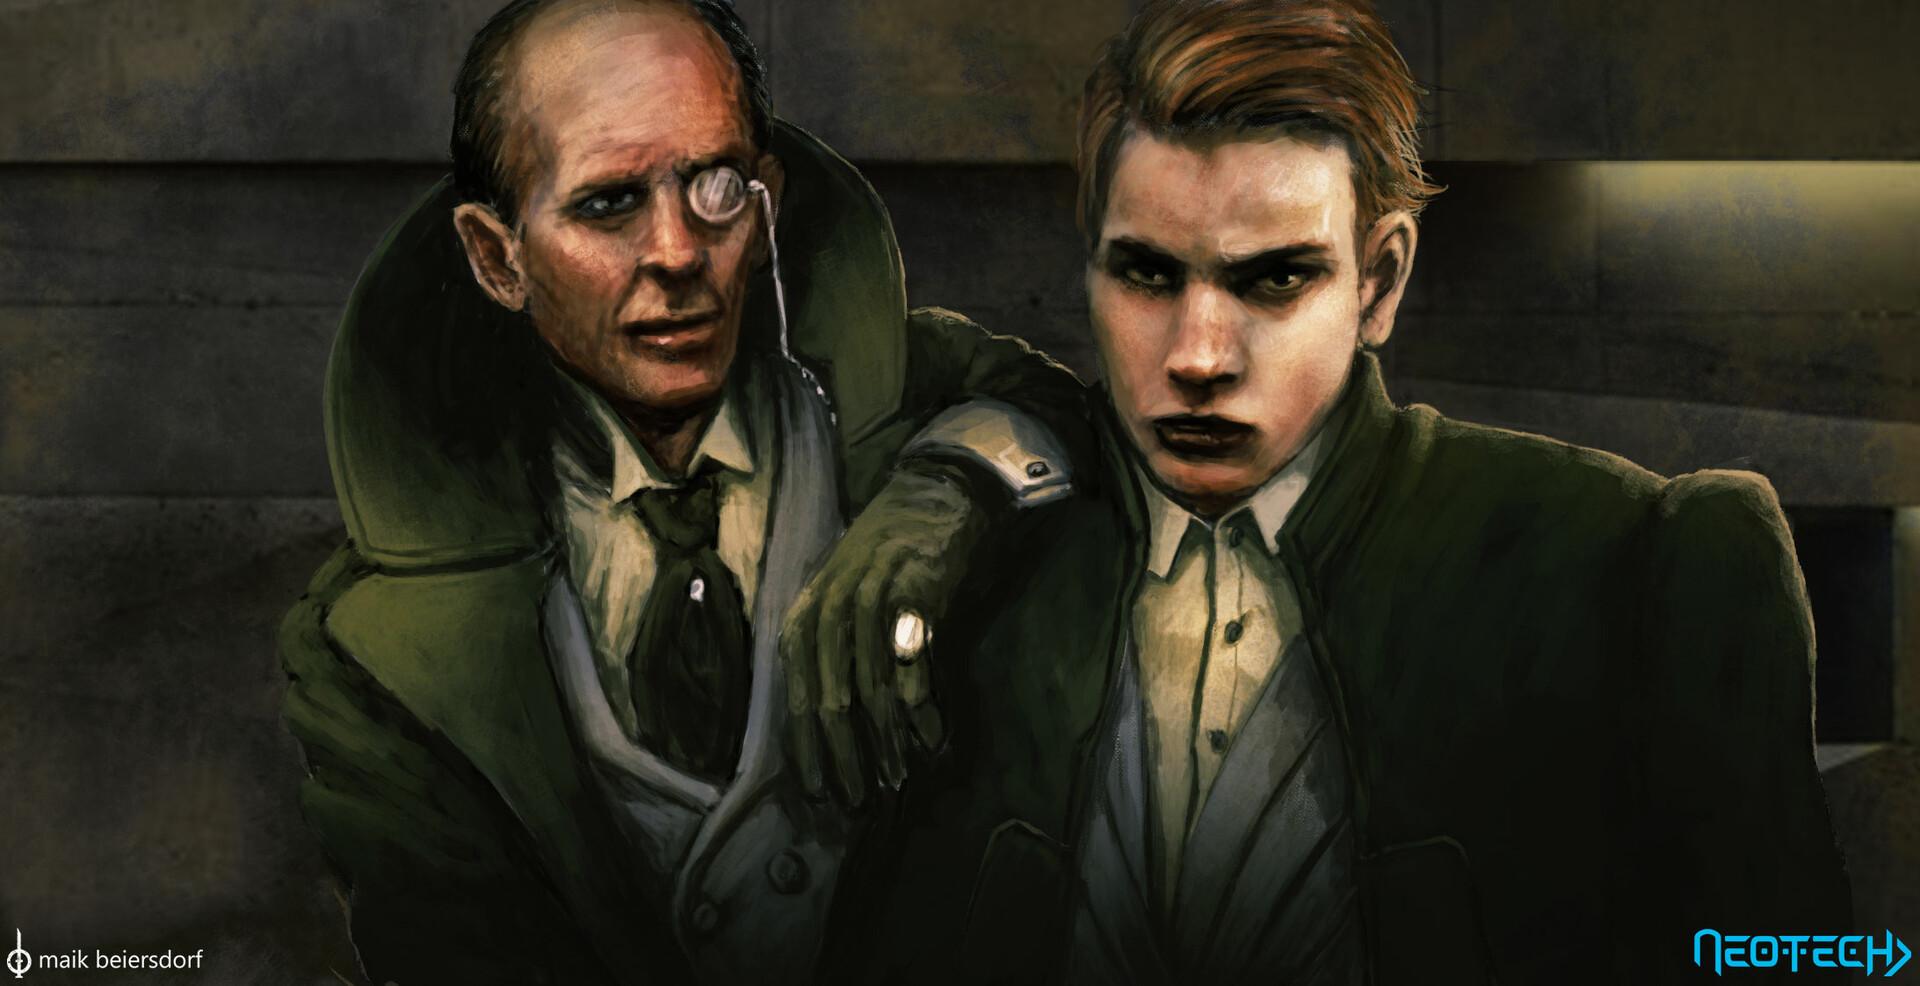 Lord Goodwin and Konrad van Meyer